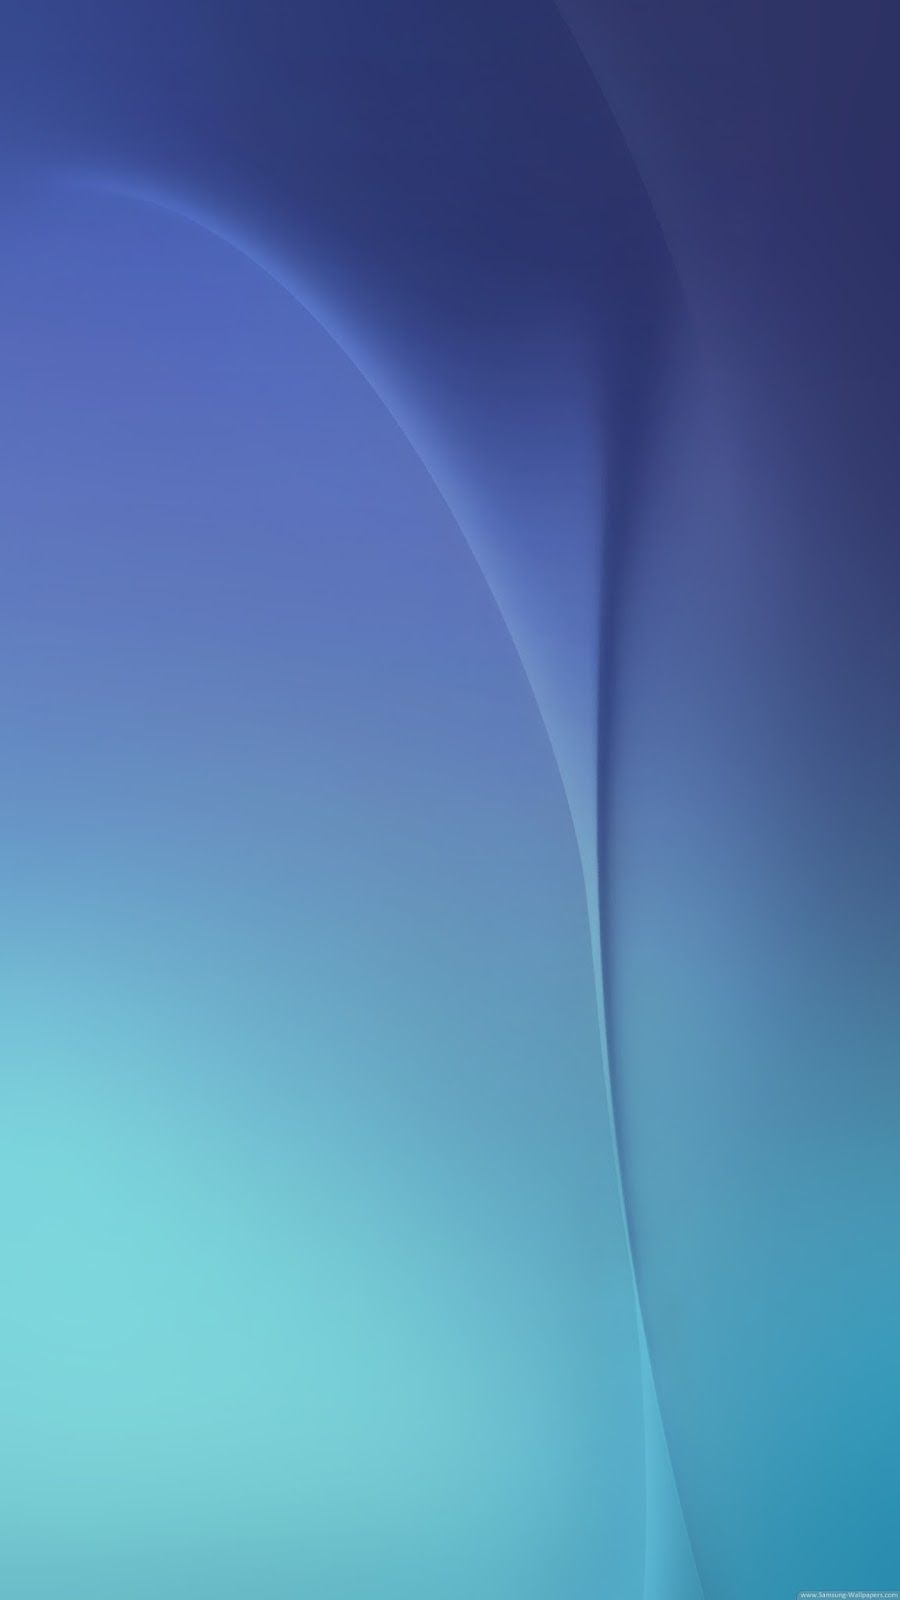 Samsung Galaxy S6 S6 Edge Hd Wallpapers Samsung Wallpaper Blue Wallpaper Iphone Samsung Galaxy Wallpaper Edge wallpaper hd download